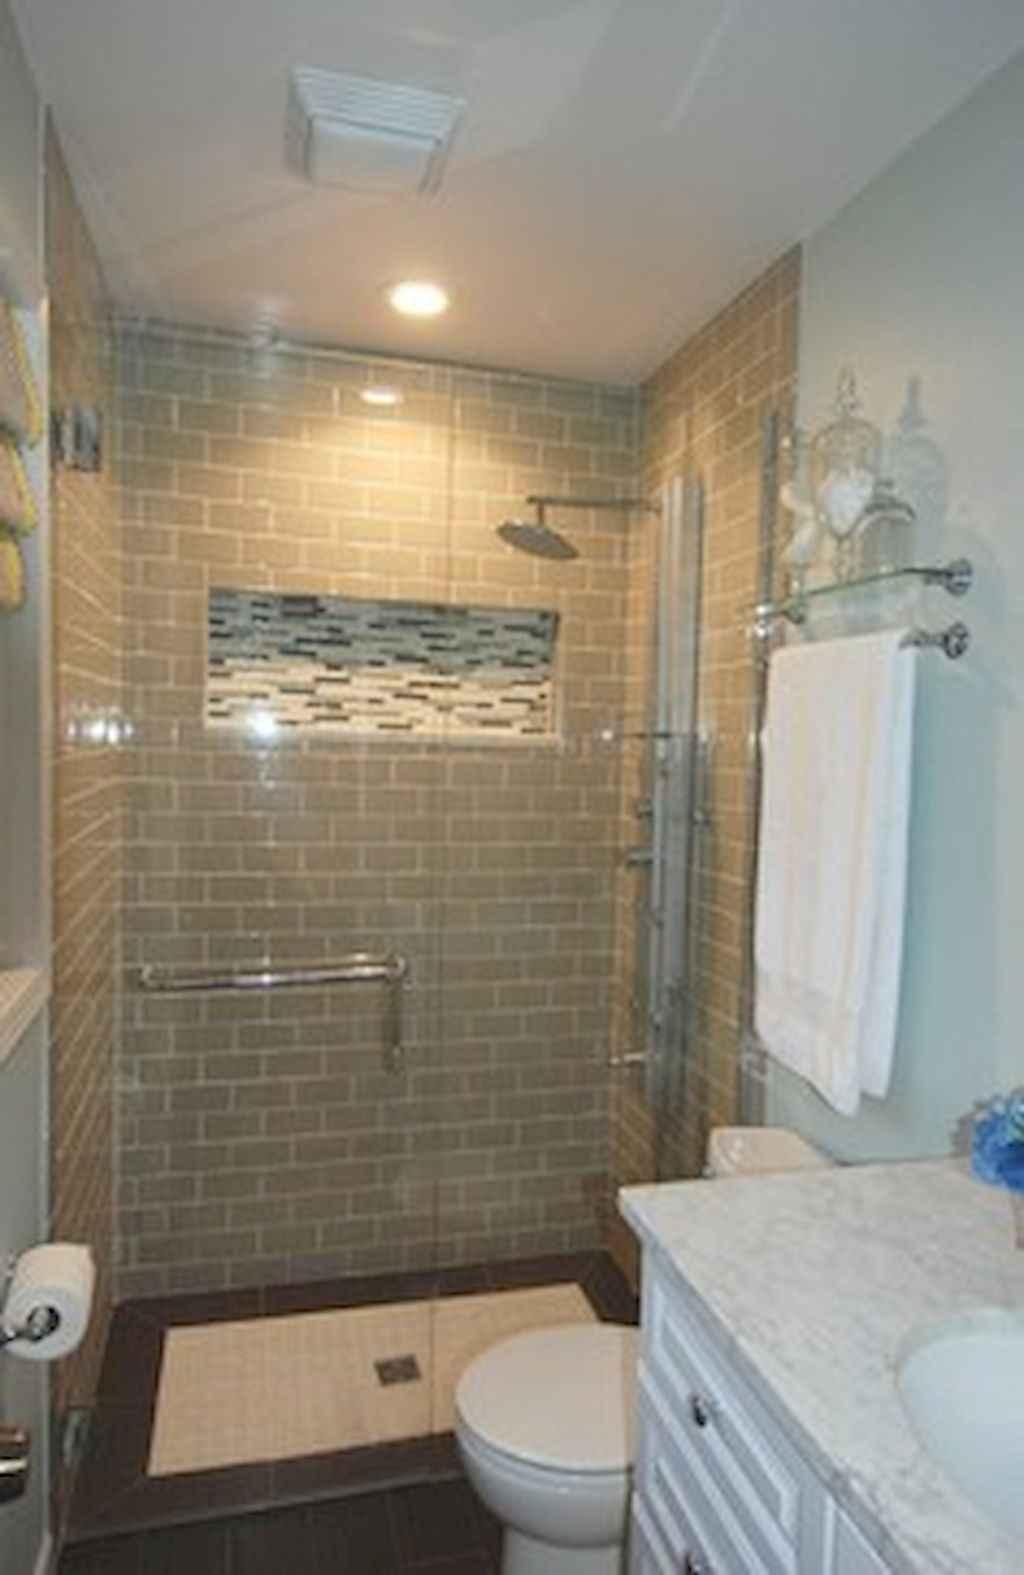 Inspiring apartment bathroom remodel ideas on a budget (14)